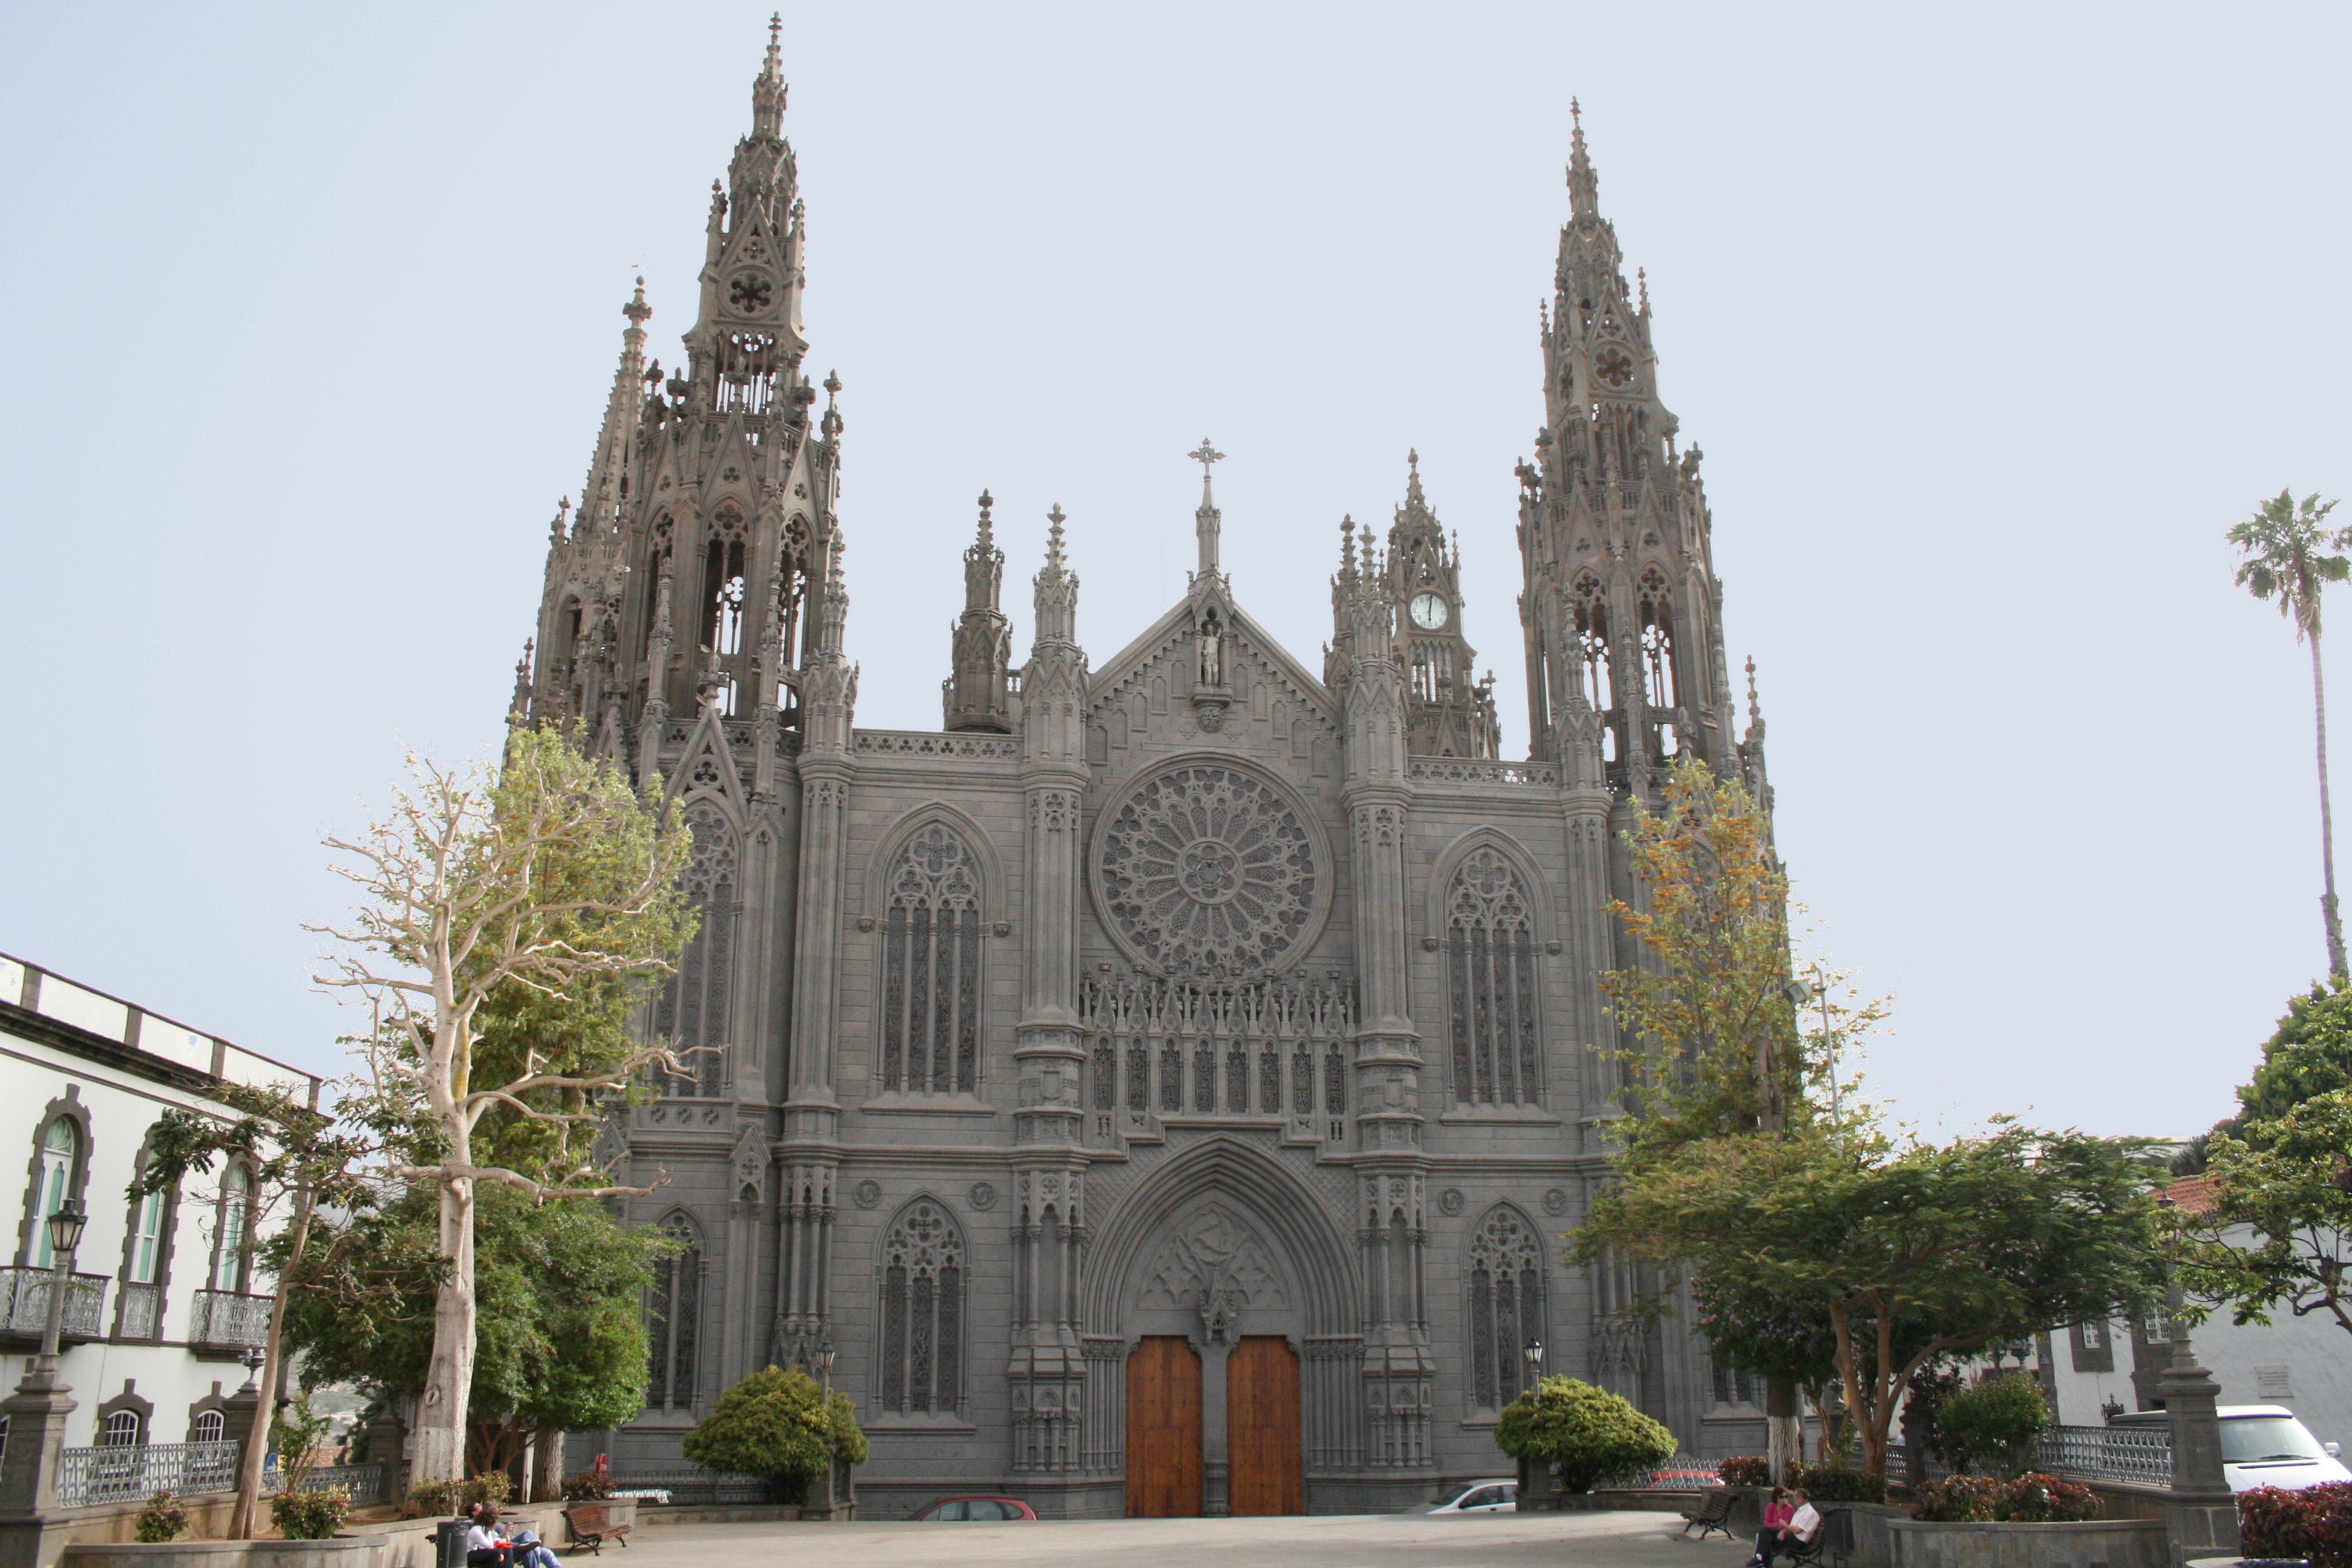 http://upload.wikimedia.org/wikipedia/commons/b/b5/Iglesia_de_Arucas.jpg